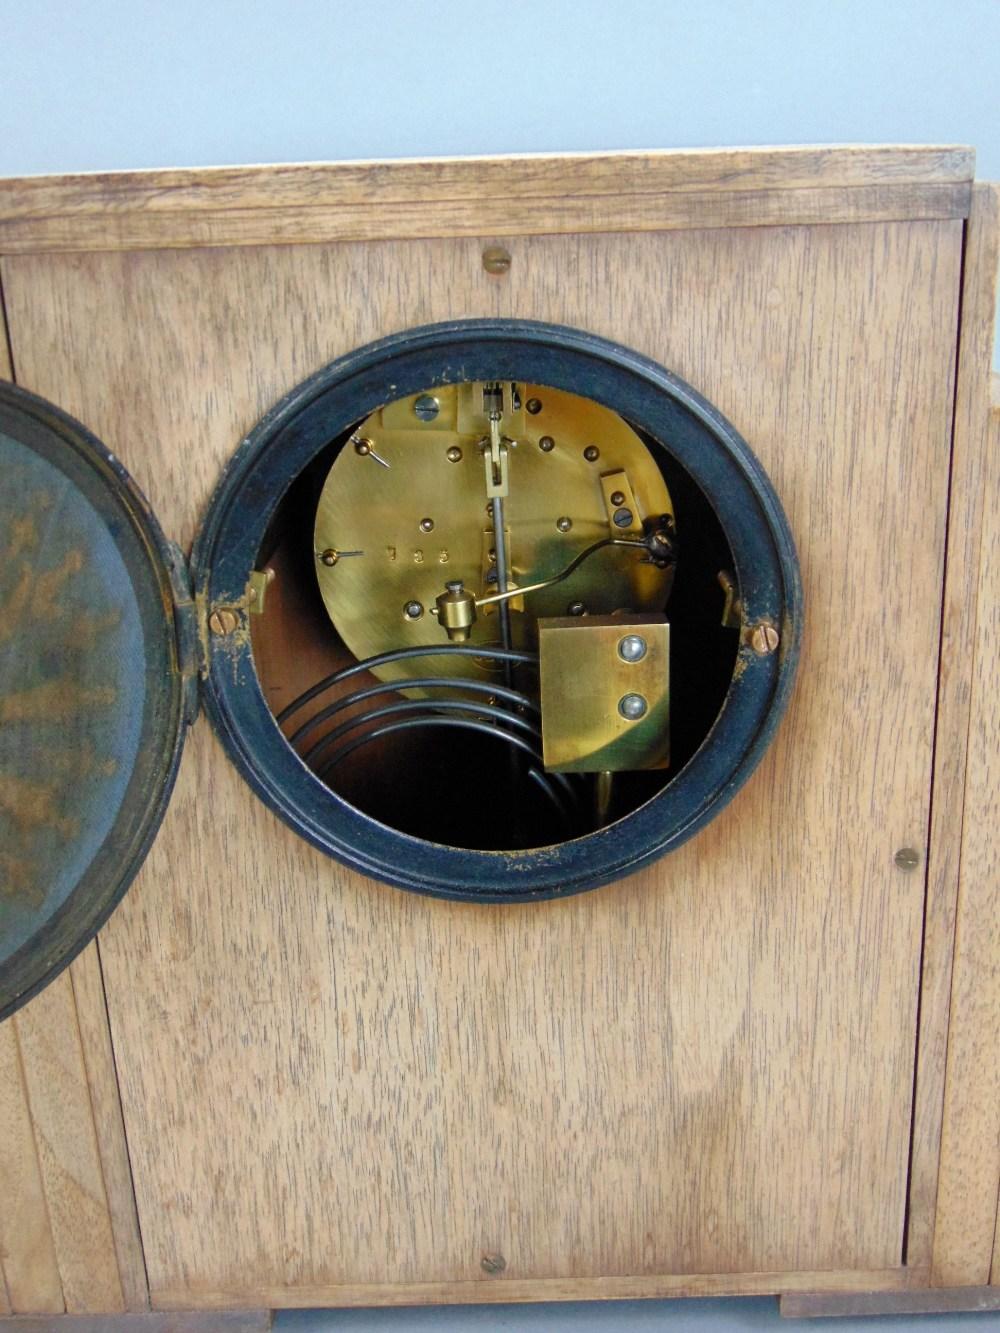 Lot 574 - Art Deco walnut cased twin train mantels clock, with enamel chapter ring, arabic numerals,